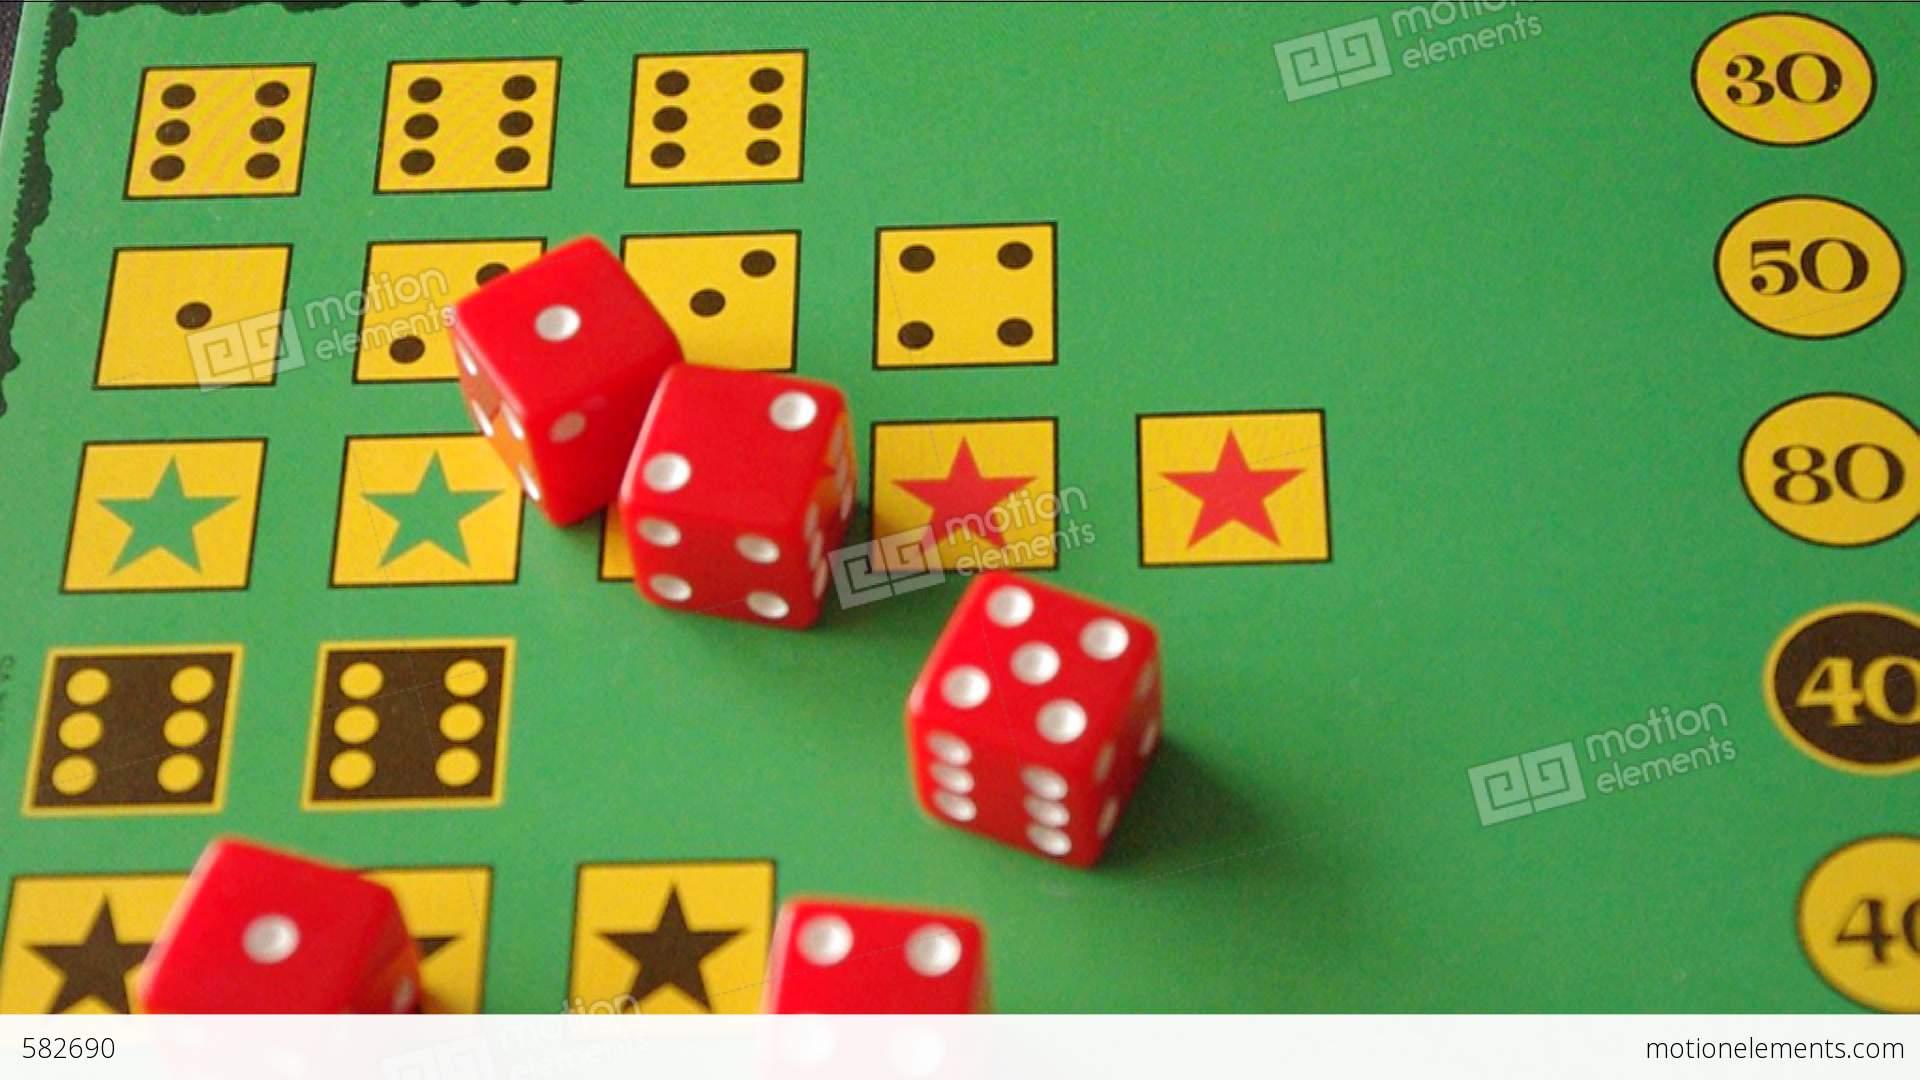 me3 casino